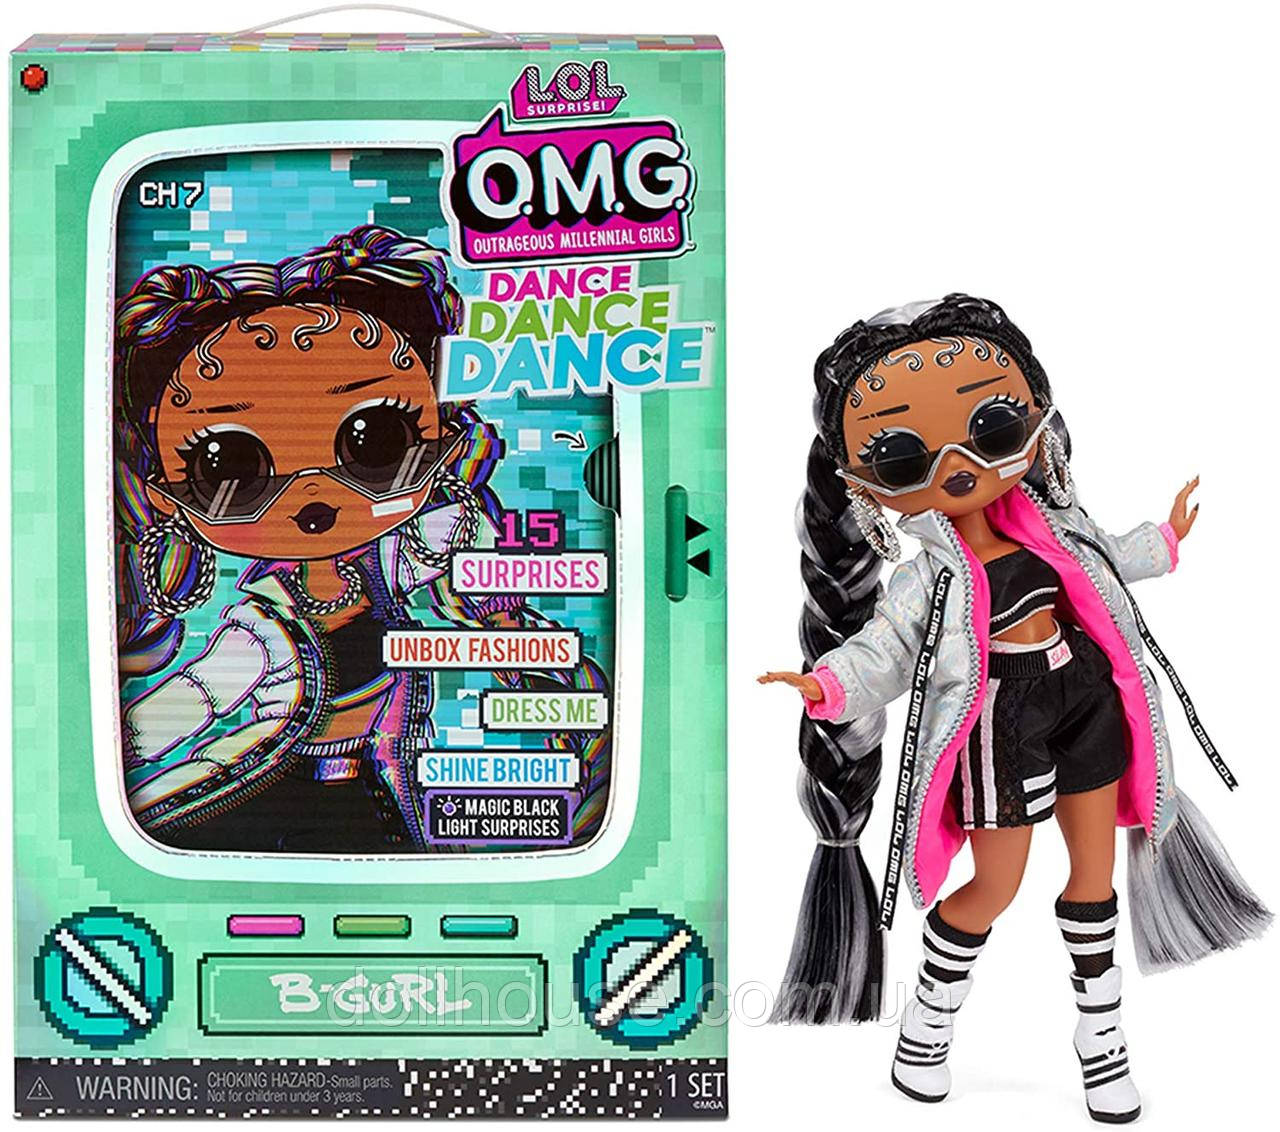 Лялька ЛОЛ ОМГ 2 серія Кендилишис Бон-Бон L. O. L. Surprise! O. M. G. Candylicious Fashion Doll with 20 Surprises